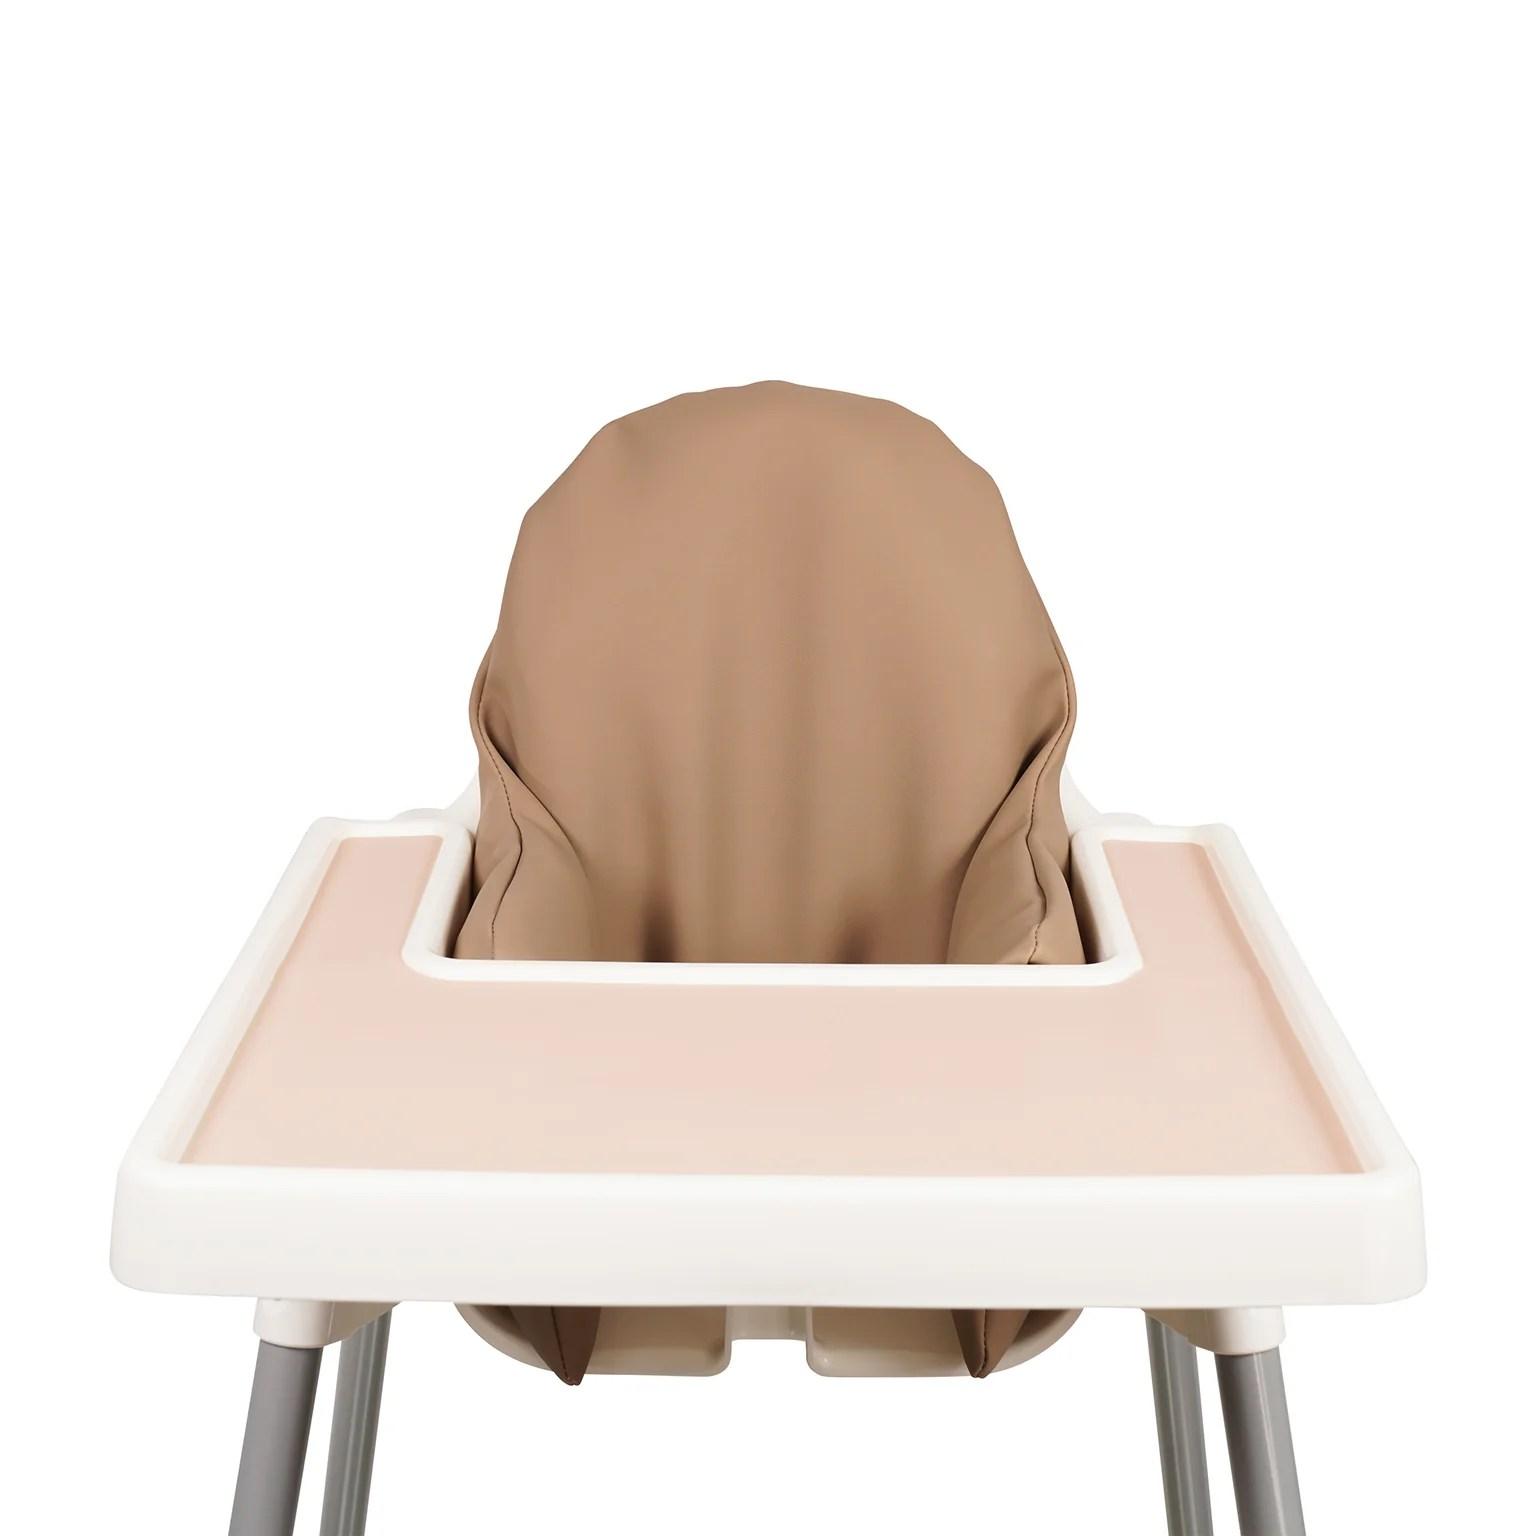 housses protections repose pieds vaisselles bebe accessoires ma chaise bebe